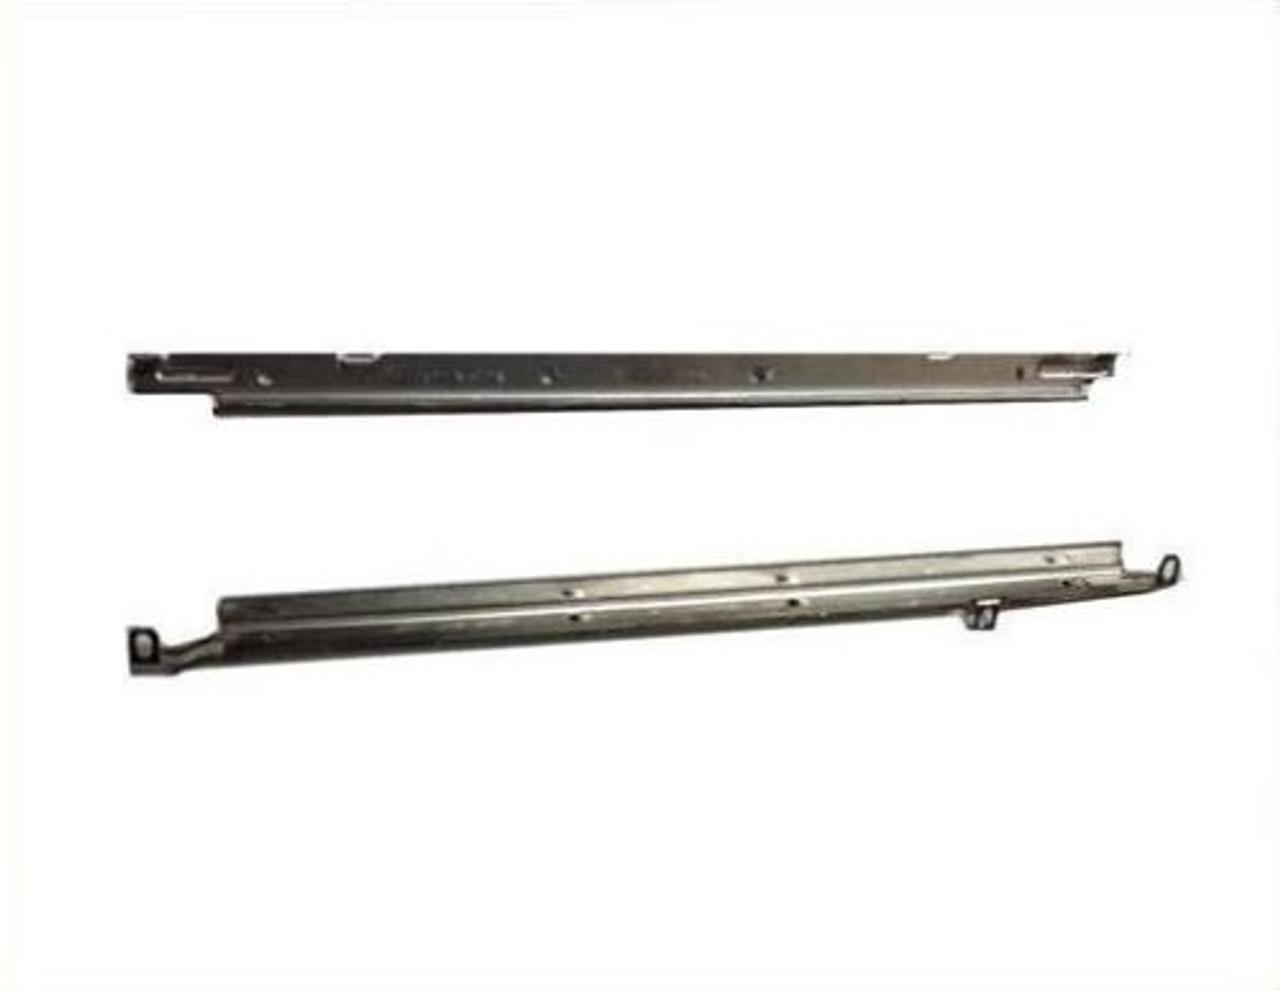 Dell Latitude E6410 ATG LCD Mounting Rail Brackets - FX303 - RK156